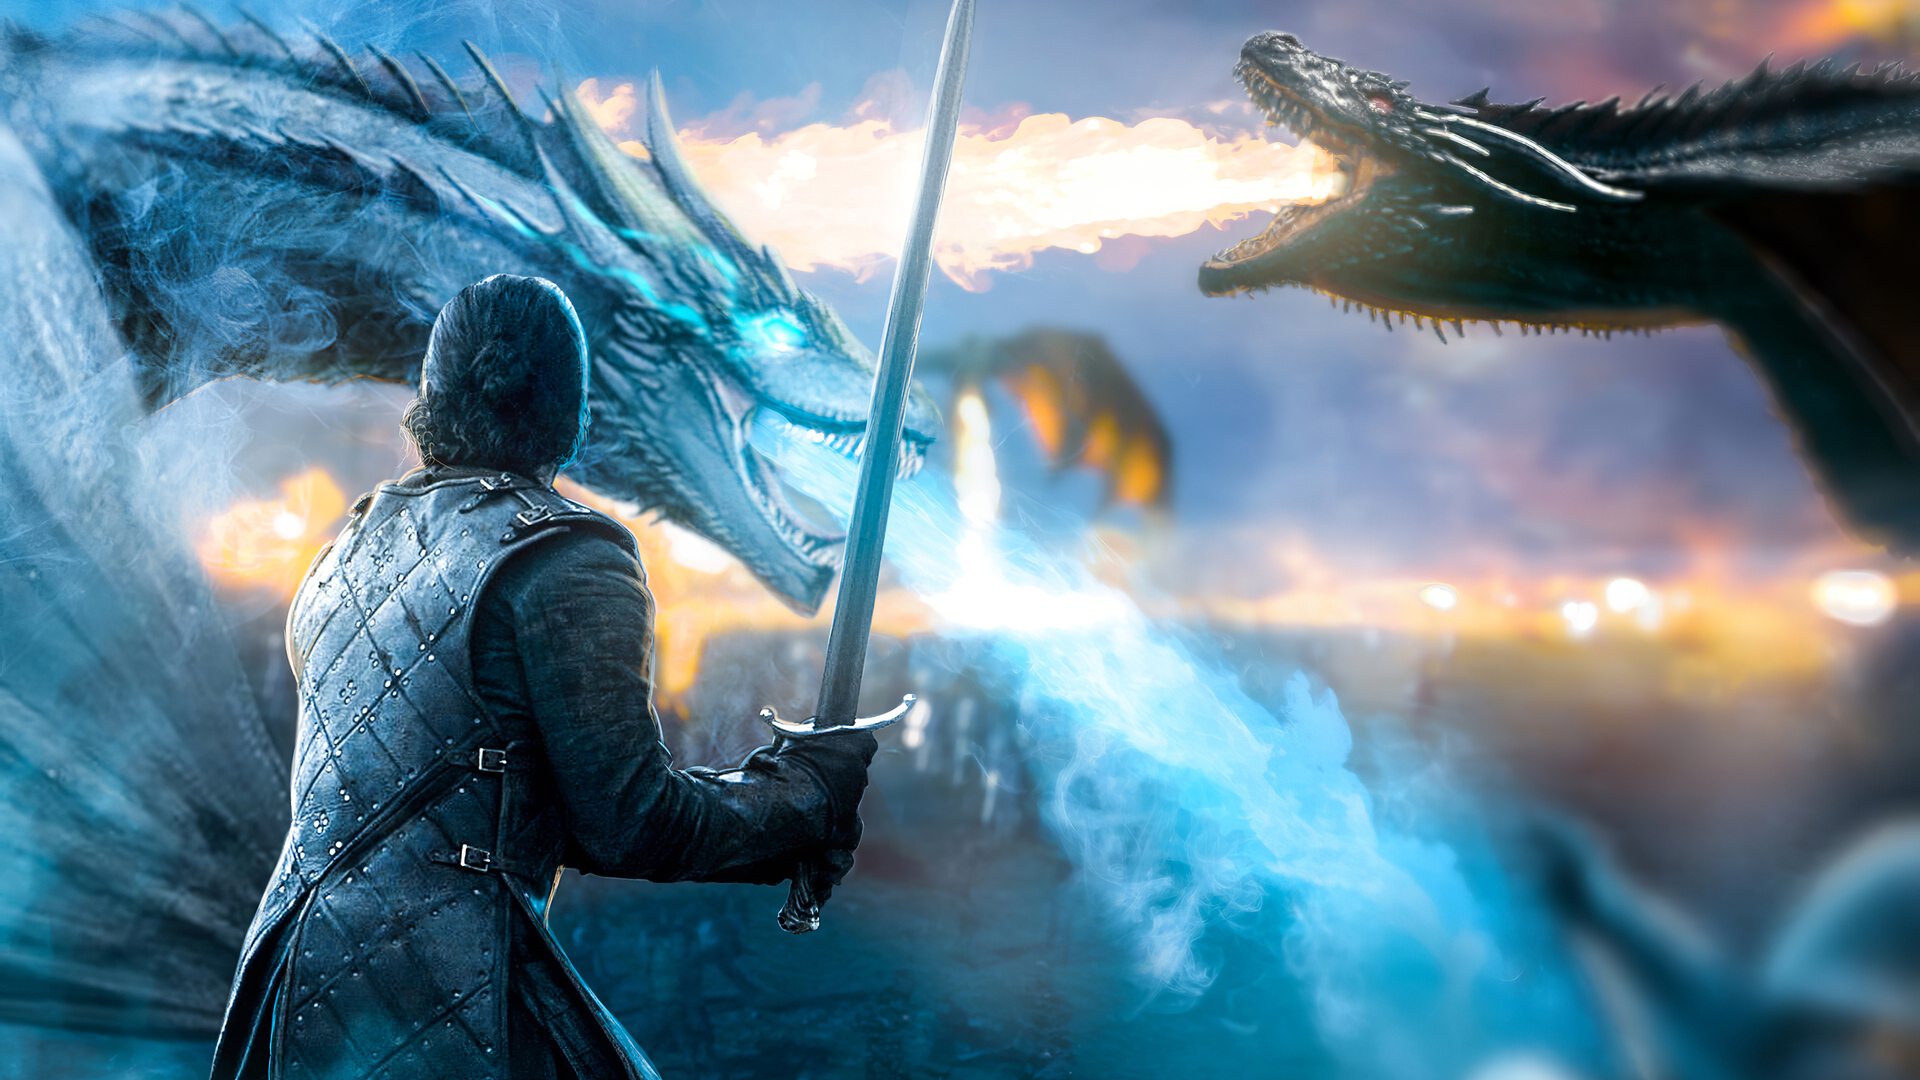 1920x1080 Jon Snow Game Of Thrones Dragon Laptop Full HD ...